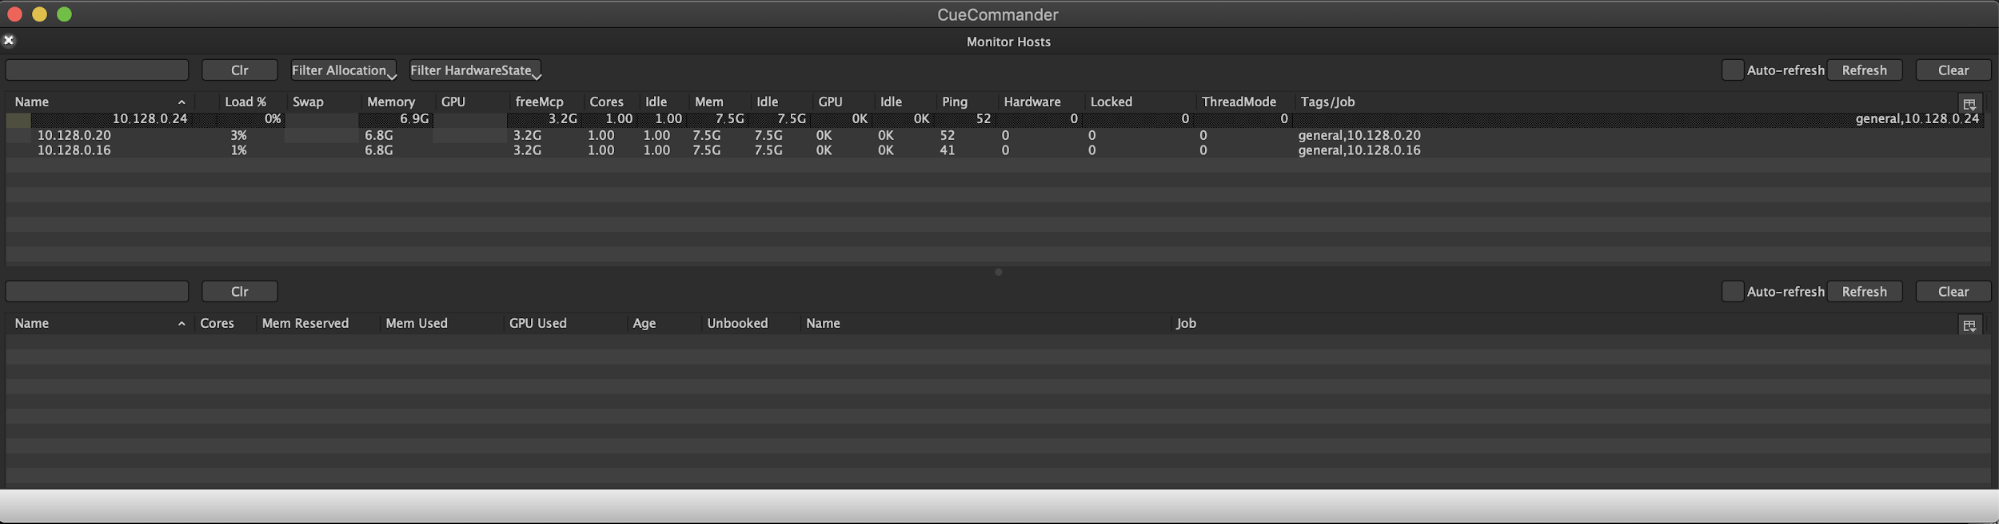 Ventana Monitor Hosts (Supervisar hosts) en OpenCue